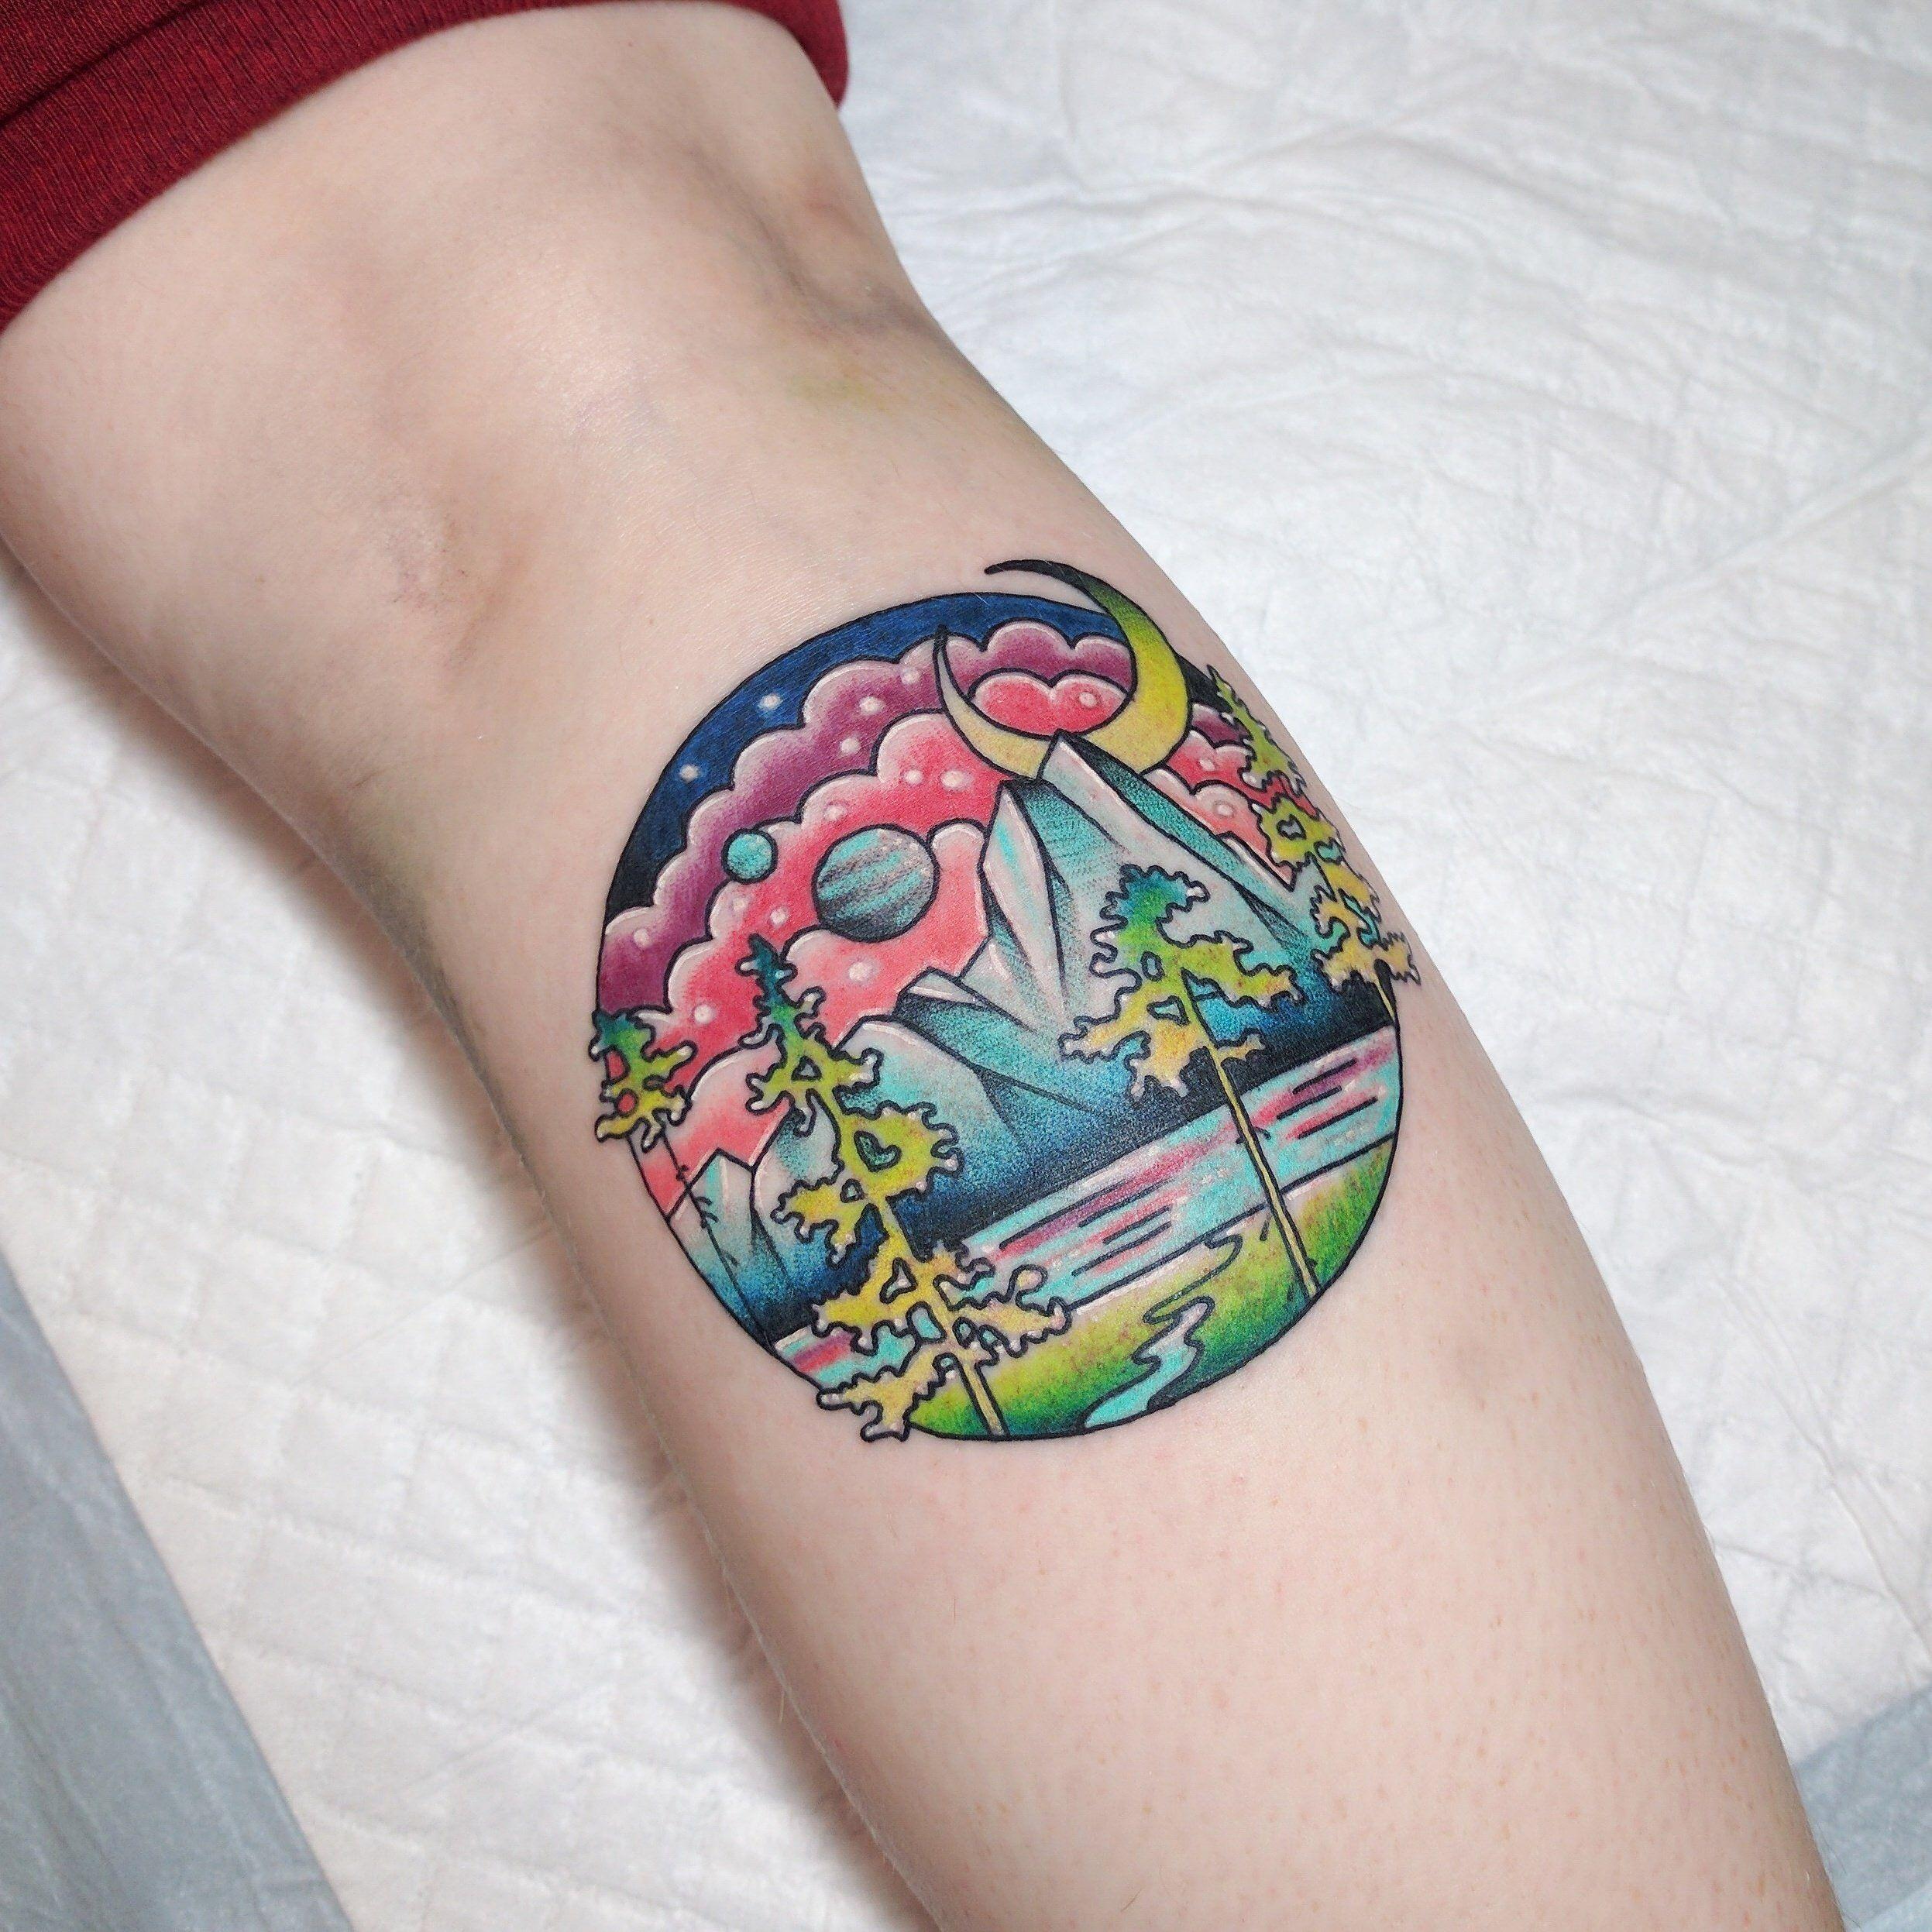 Kate decosmo eurphoria ink tattoos pinterest ink tattoo and